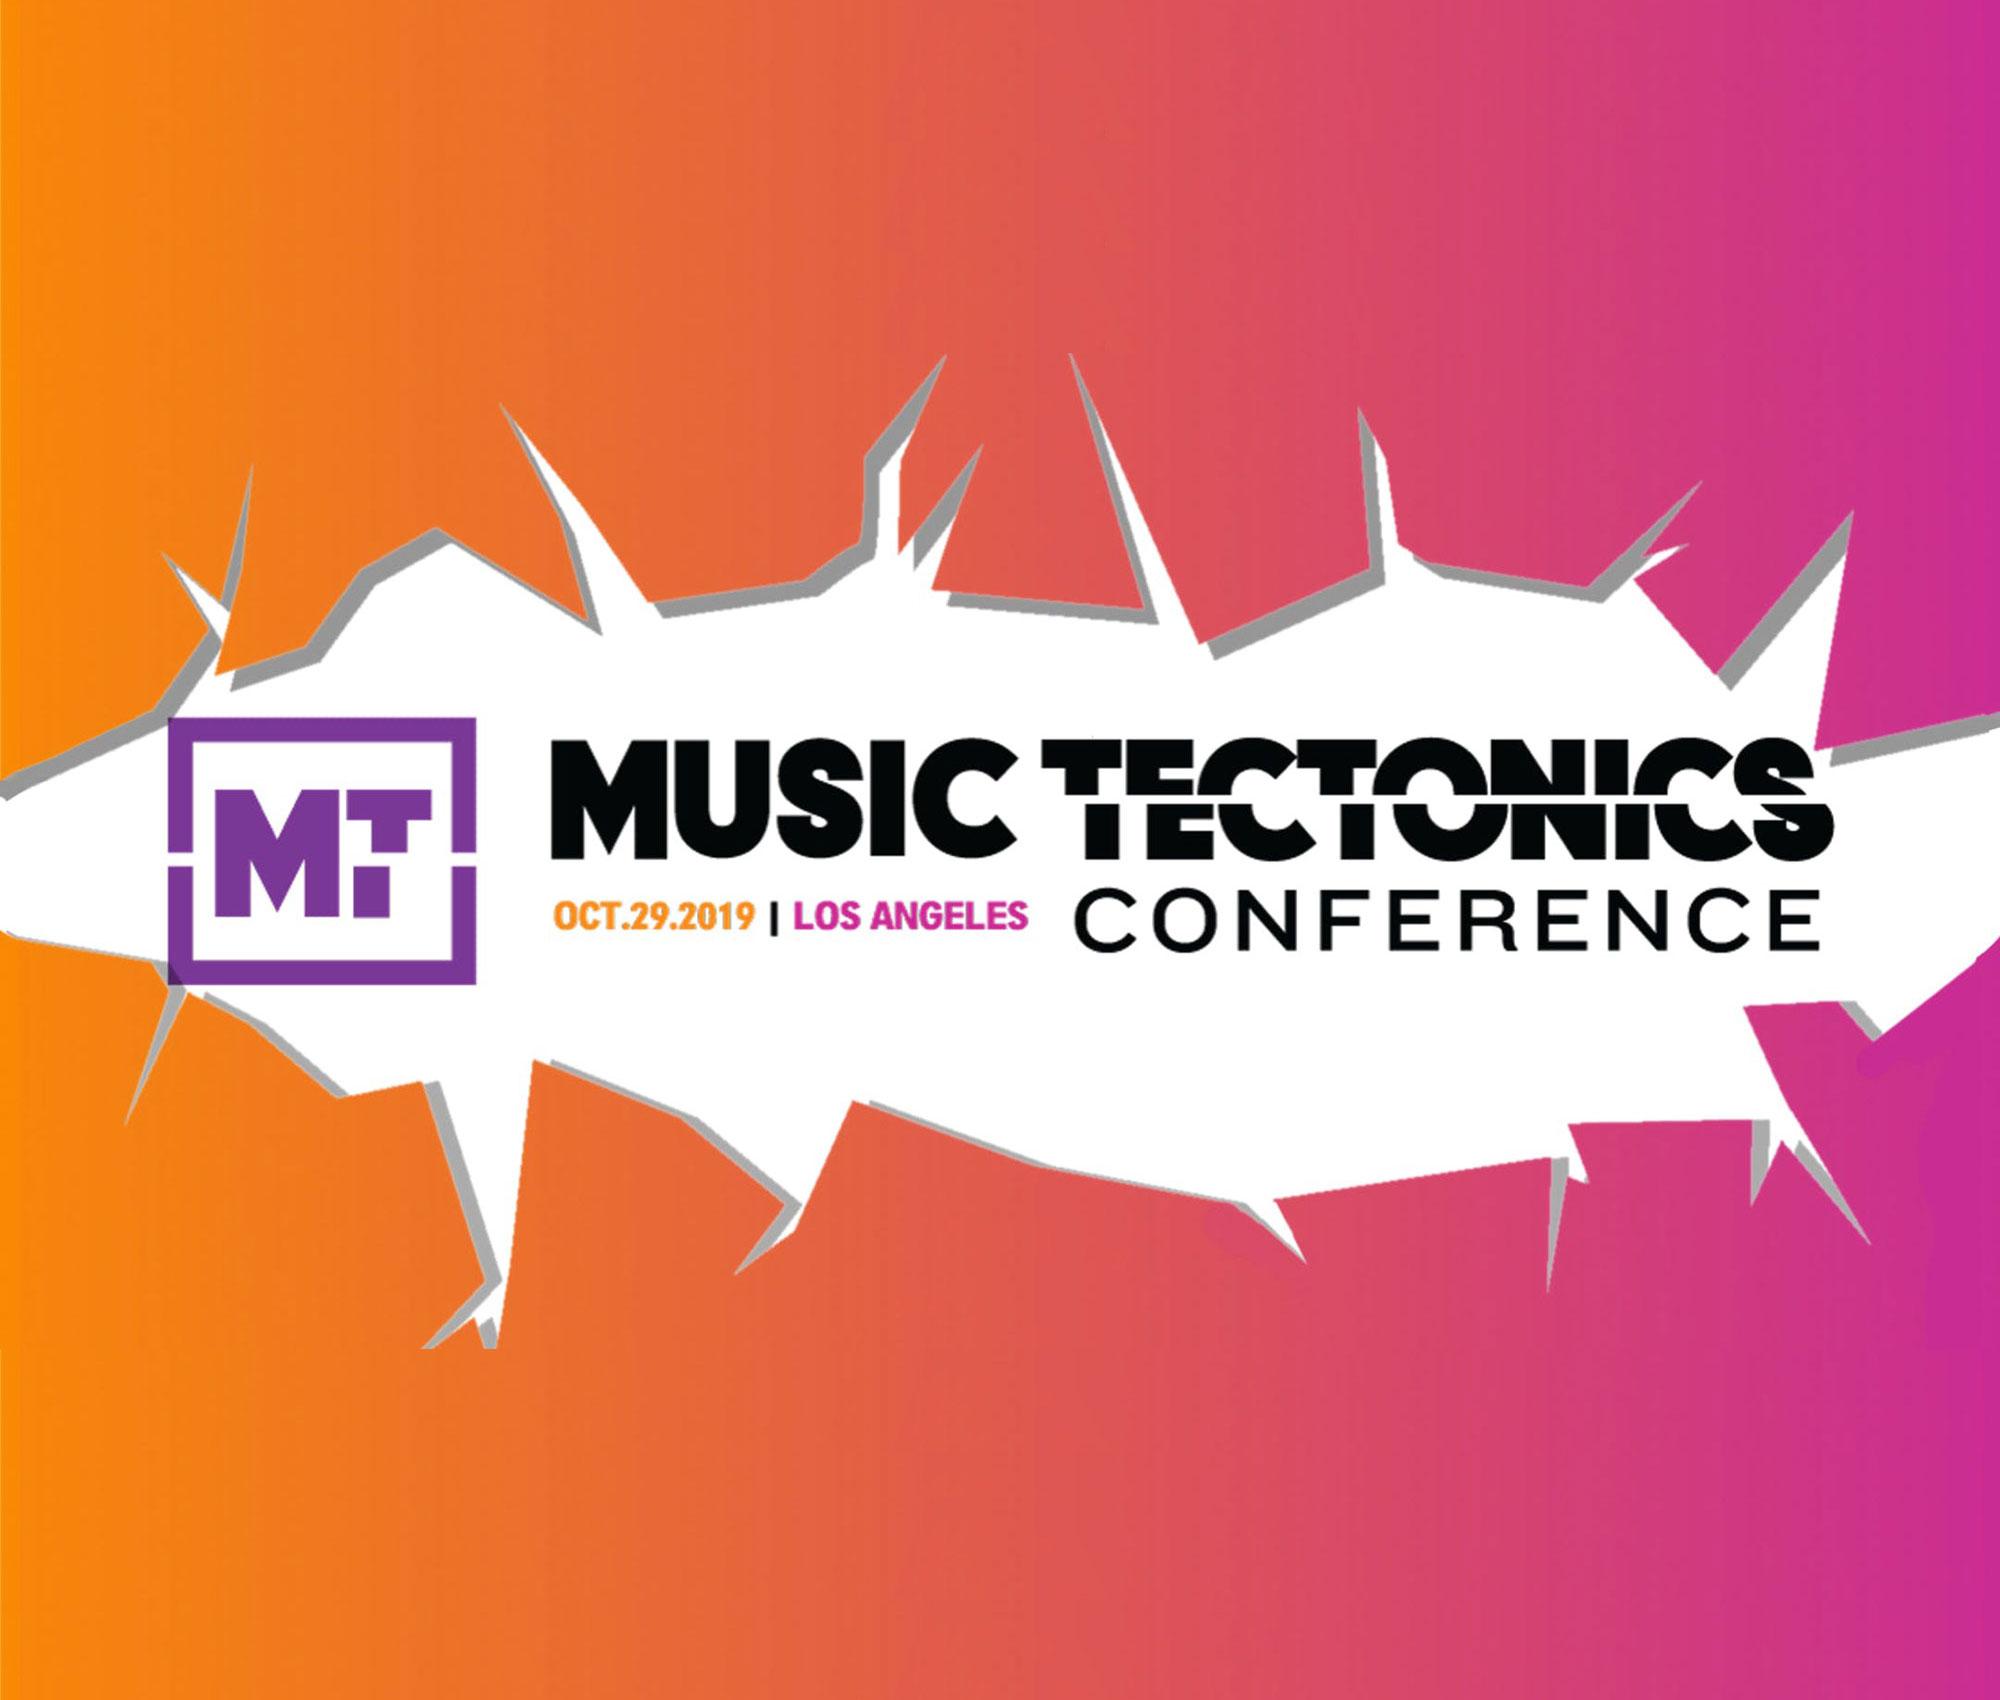 Music Tectonics Conference 2019